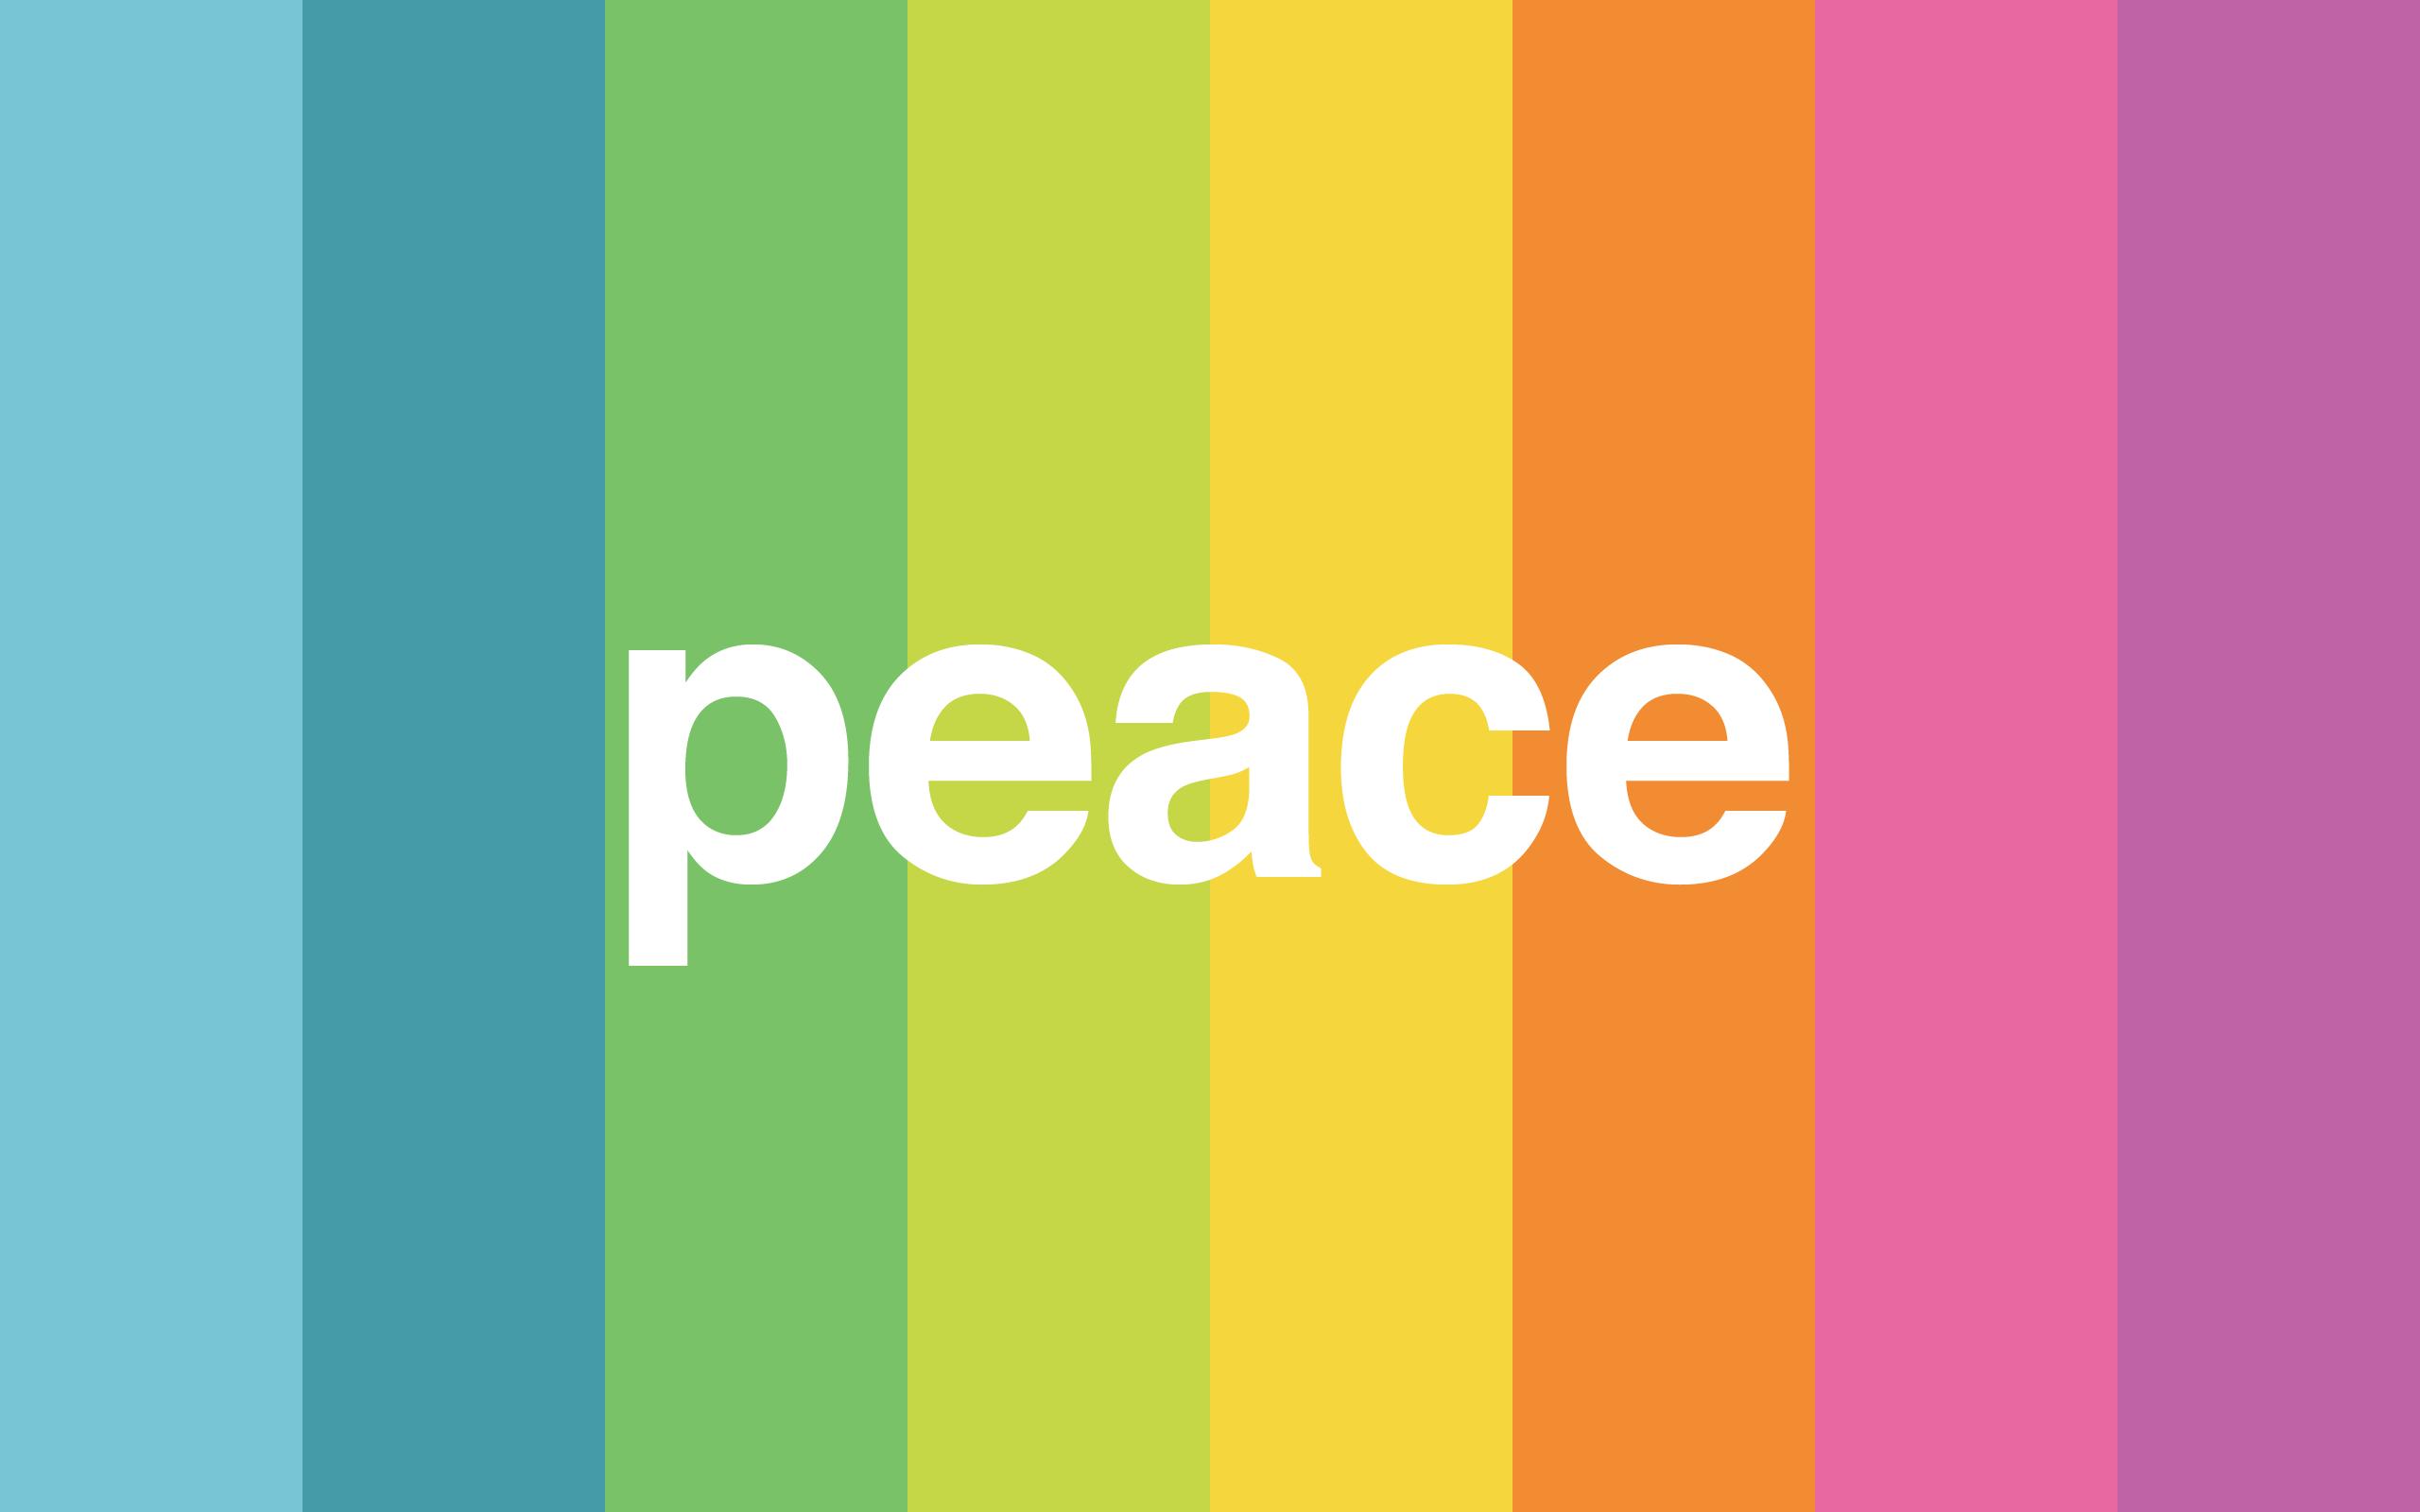 times we need Gods inner peace Carrickmacross Baptist Church 2560x1600